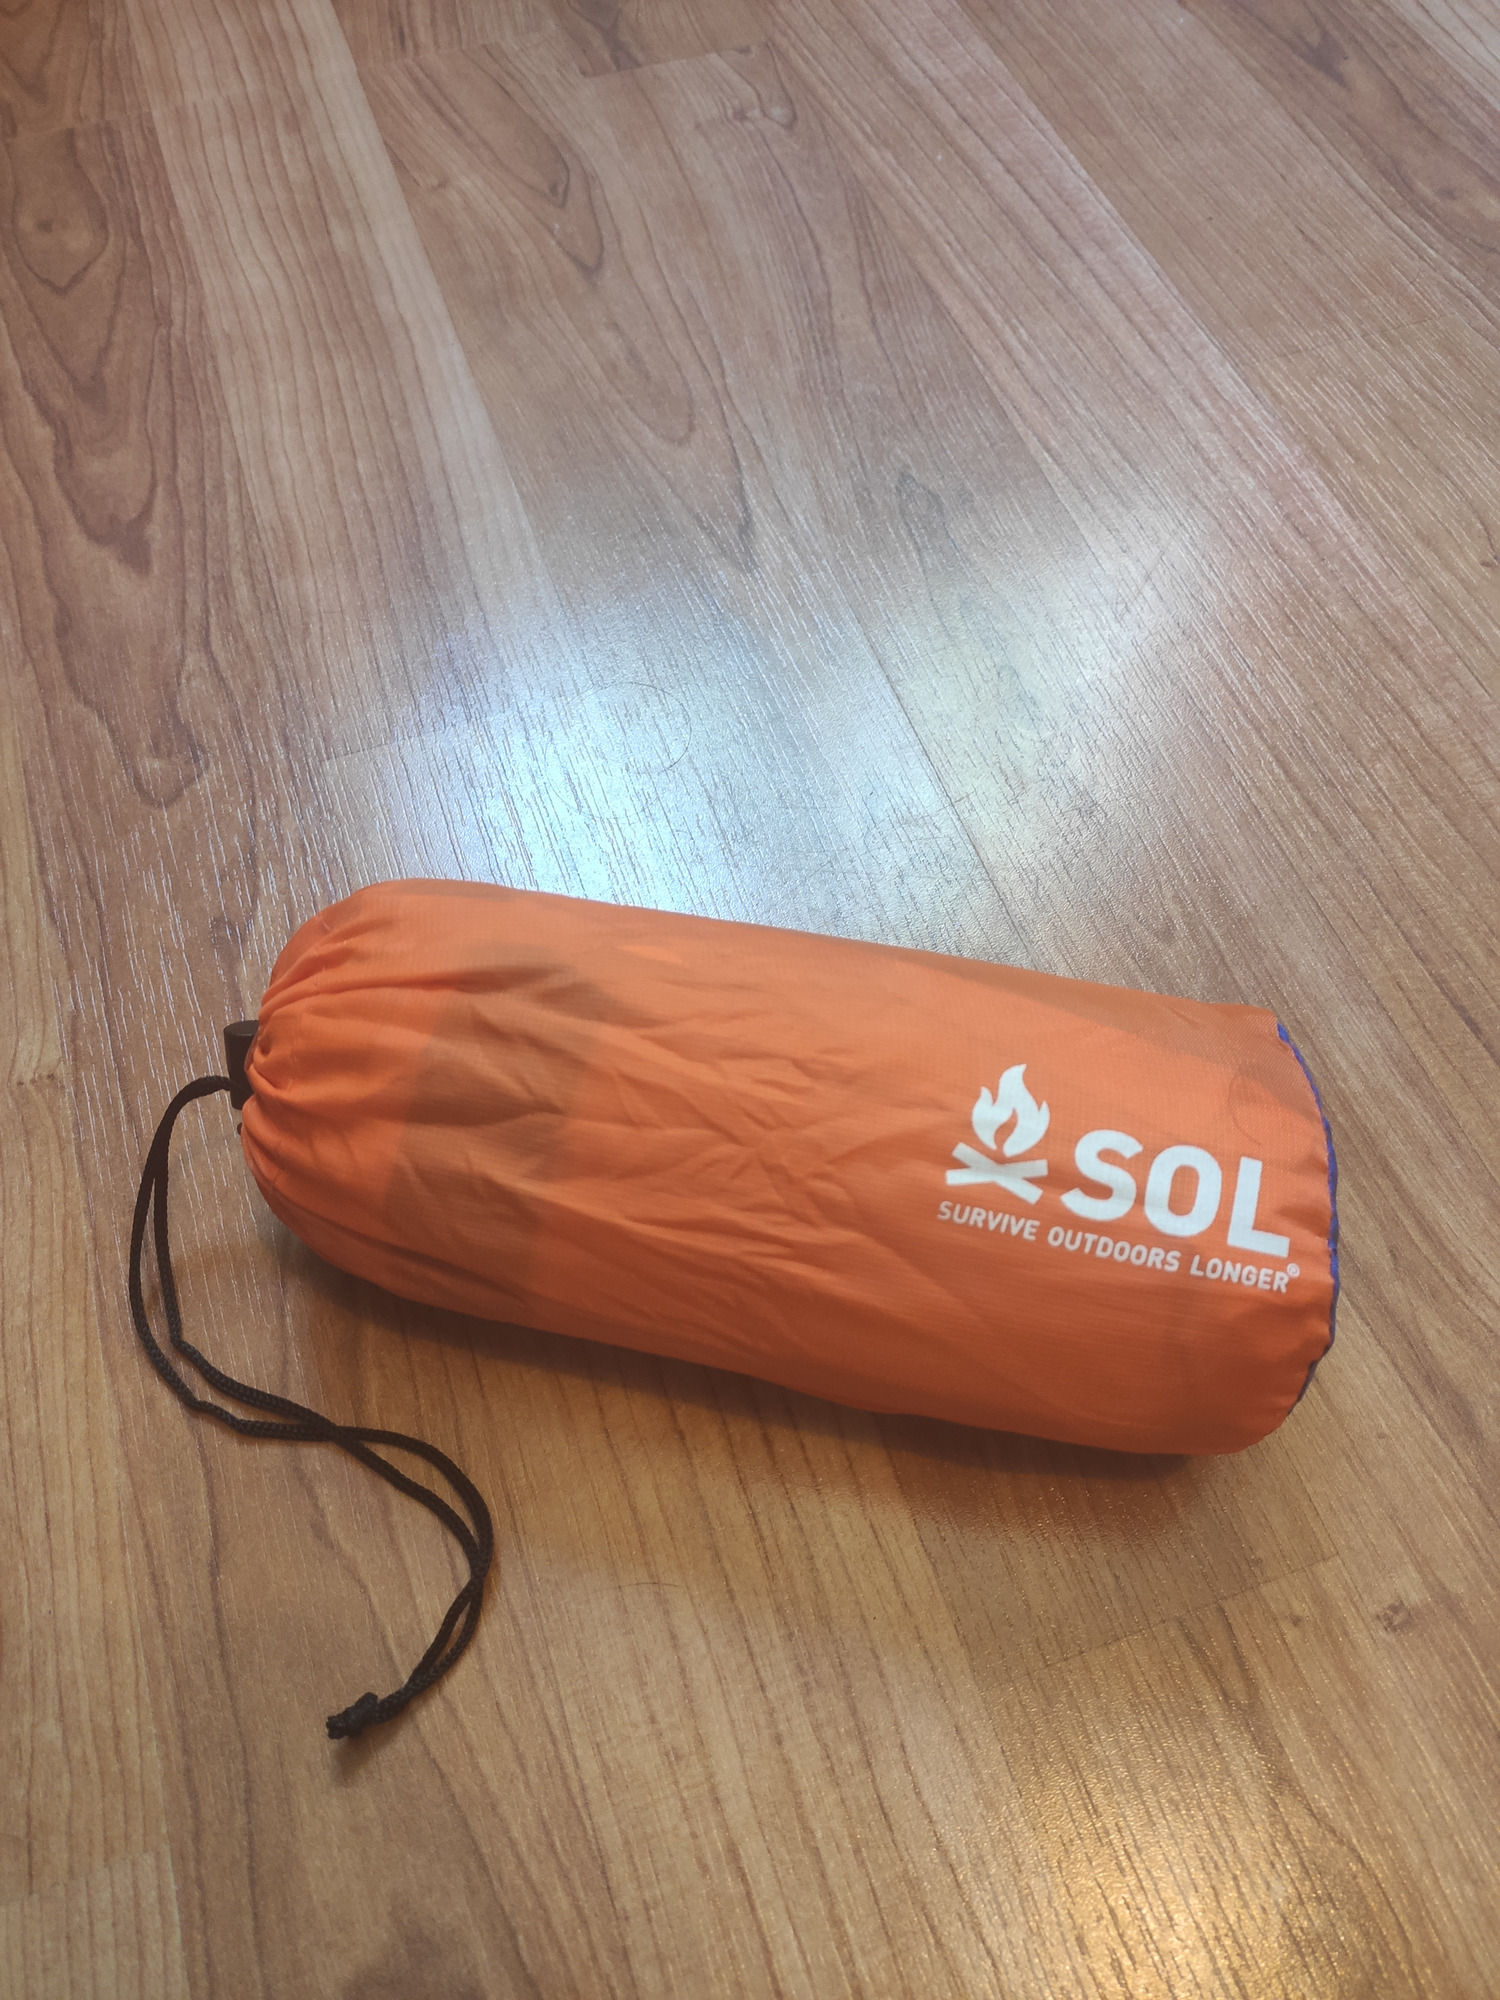 SOL Emergency Bivvy Bag